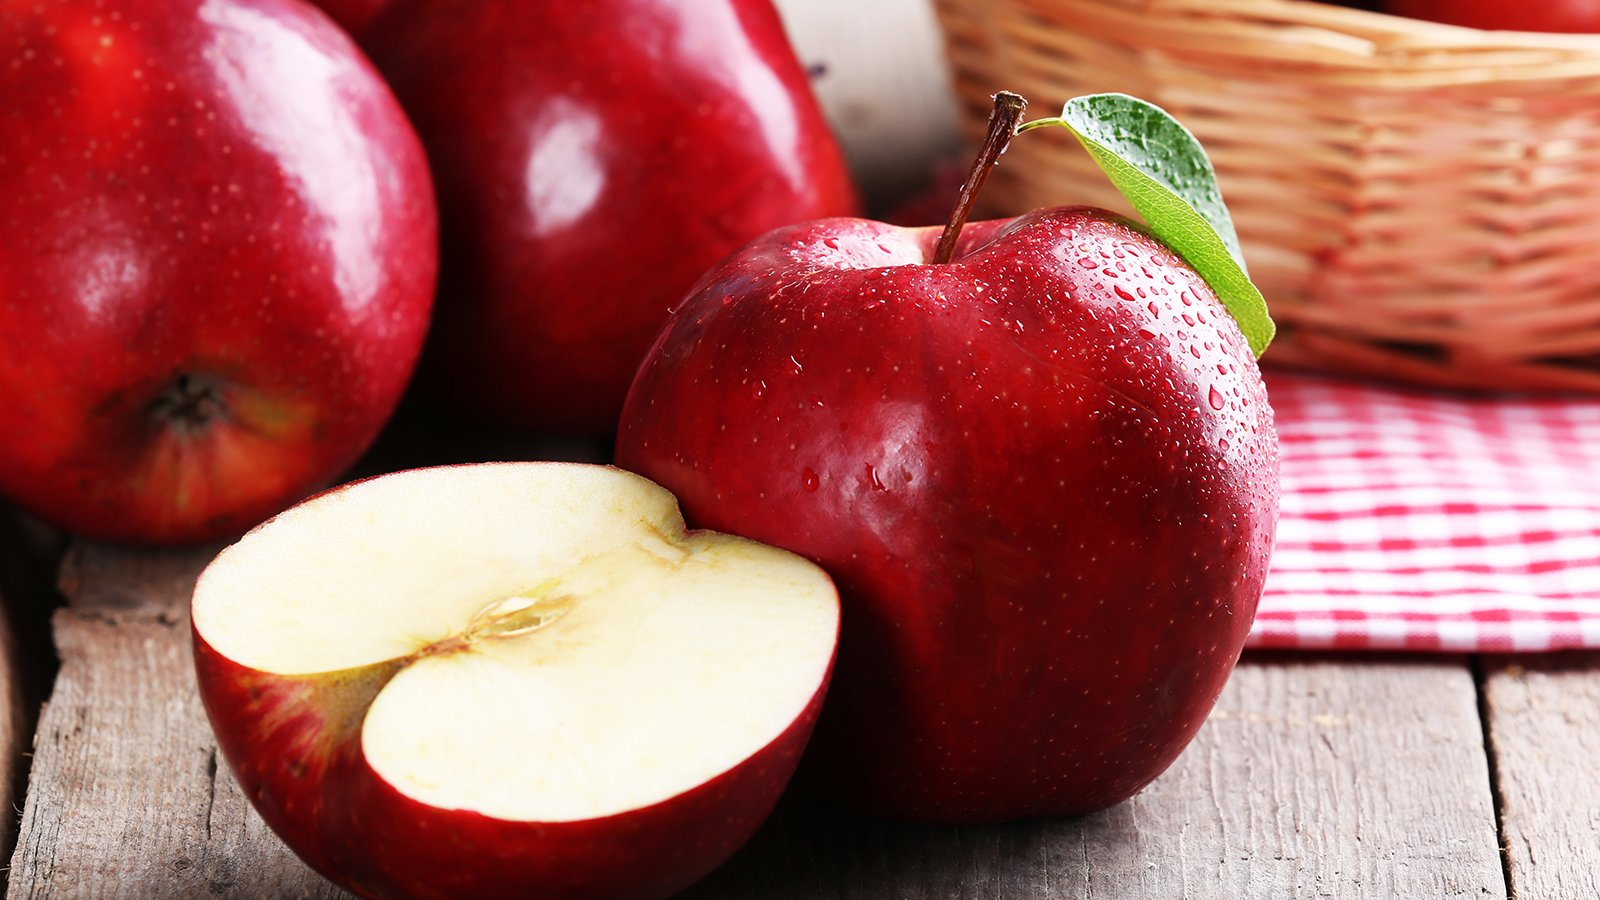 Mele rosse con foglie verdi e Apple Slice